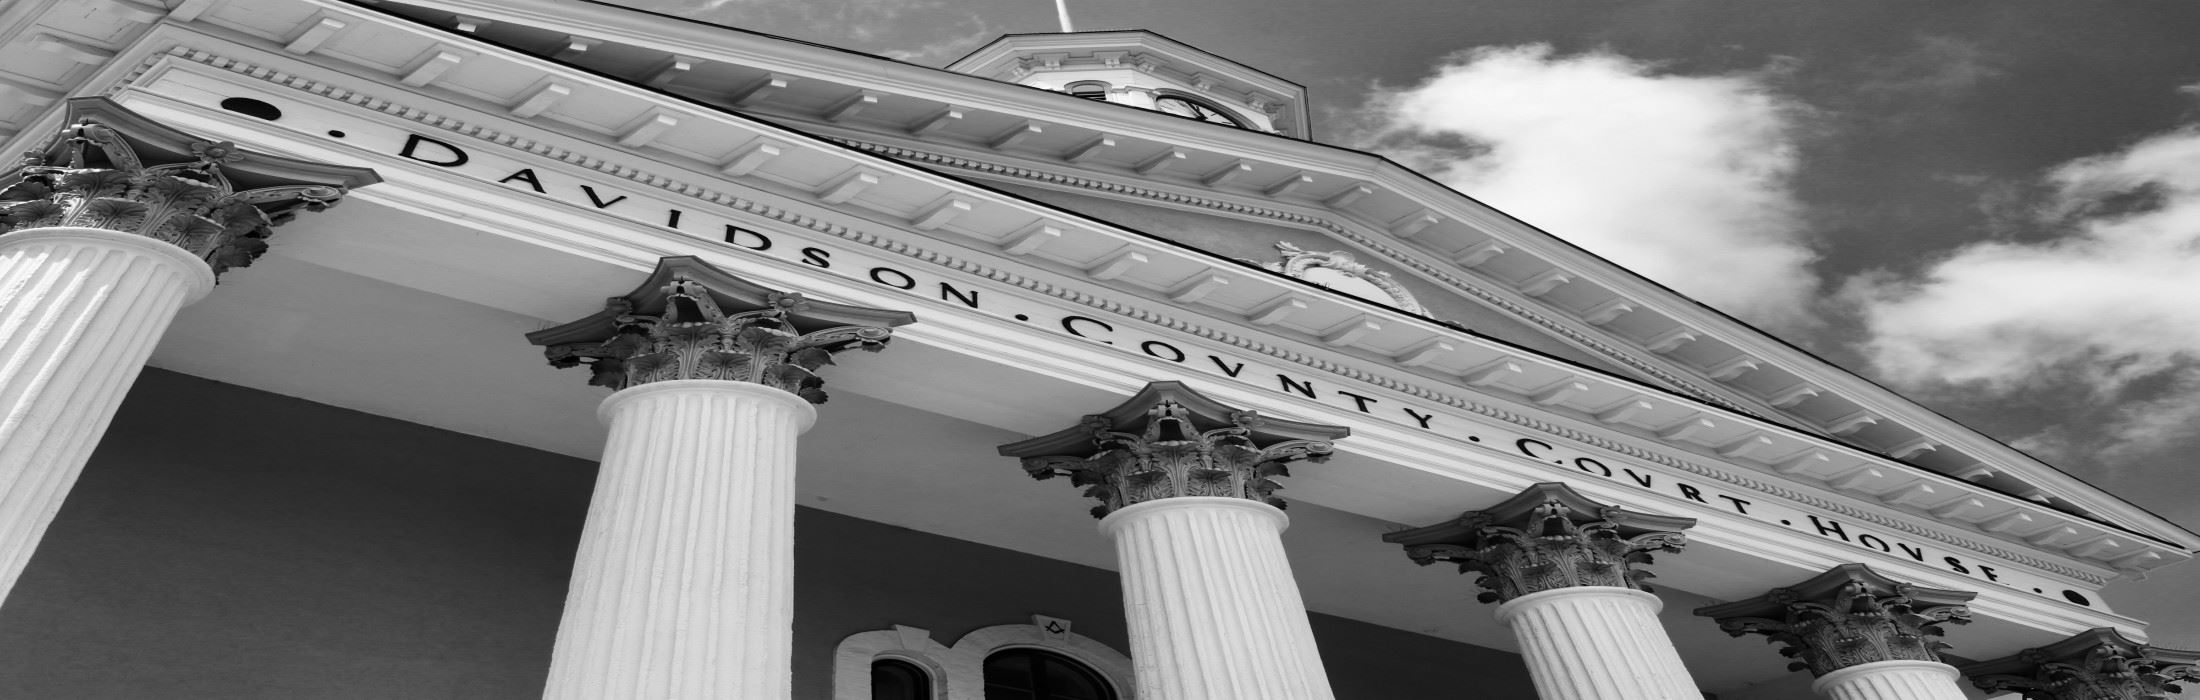 Vacancies | Davidson County, NC